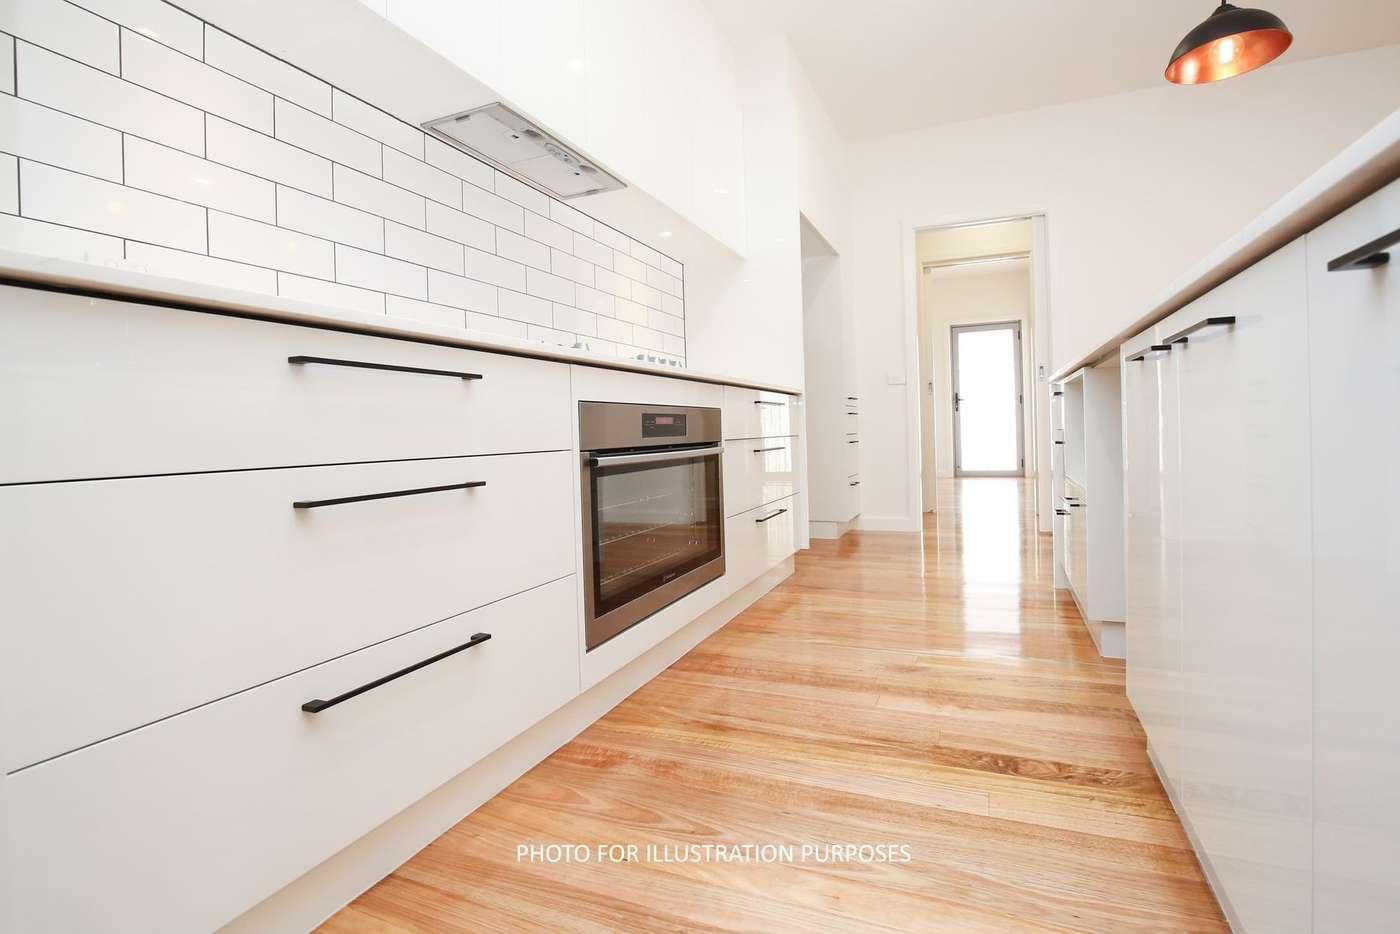 Sixth view of Homely house listing, 8 Limpidi Drive, Mildura VIC 3500